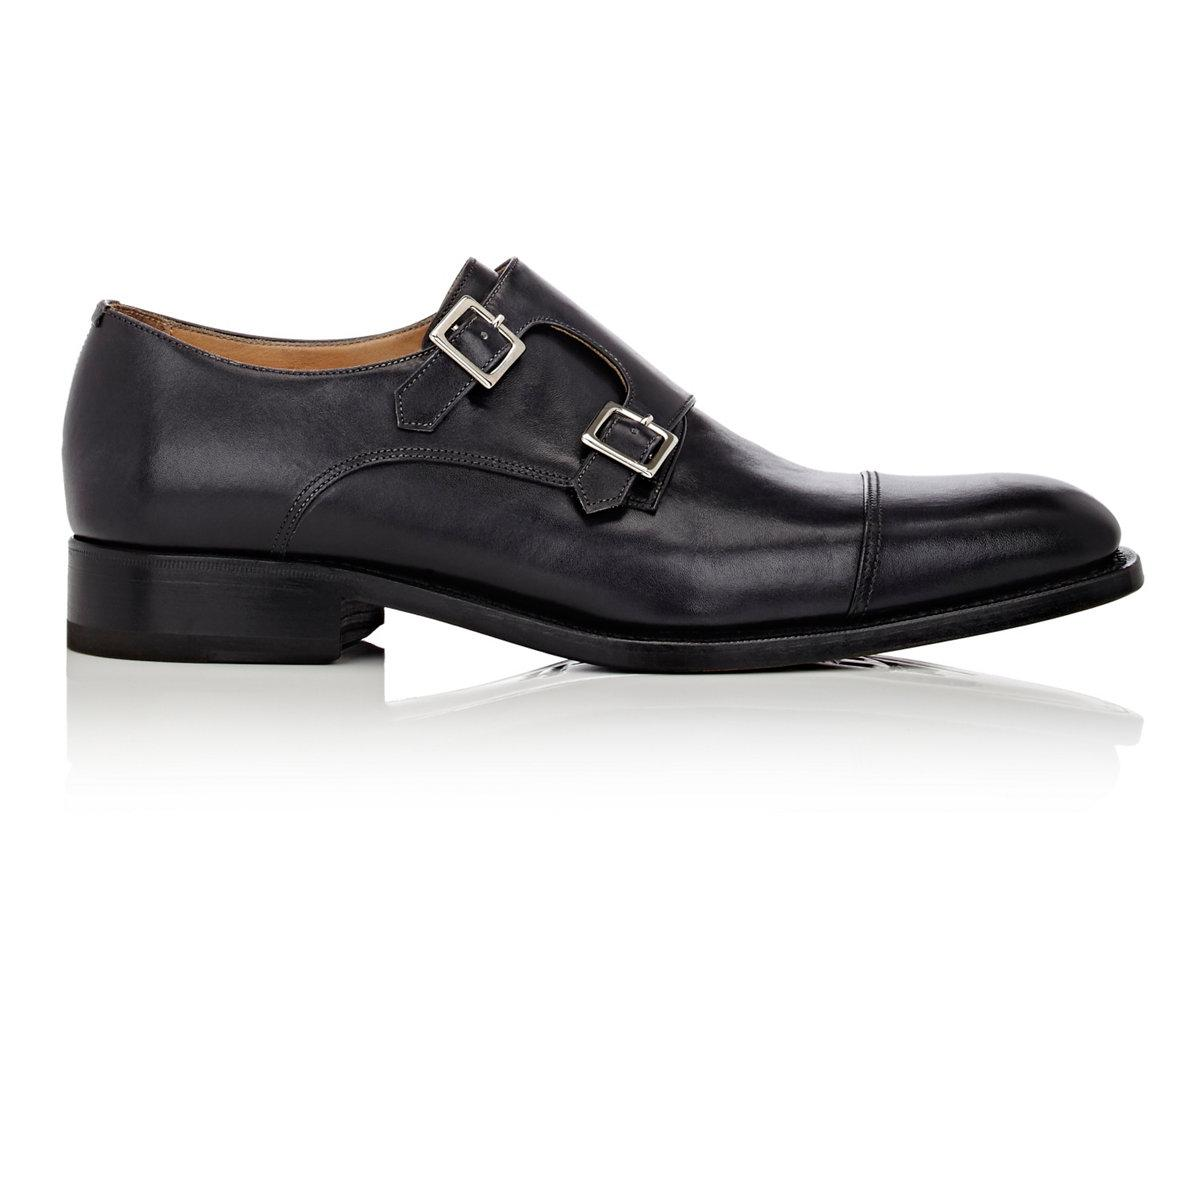 Mens Stitch-Detail Monk-Strap Shoes Harris v5xhi